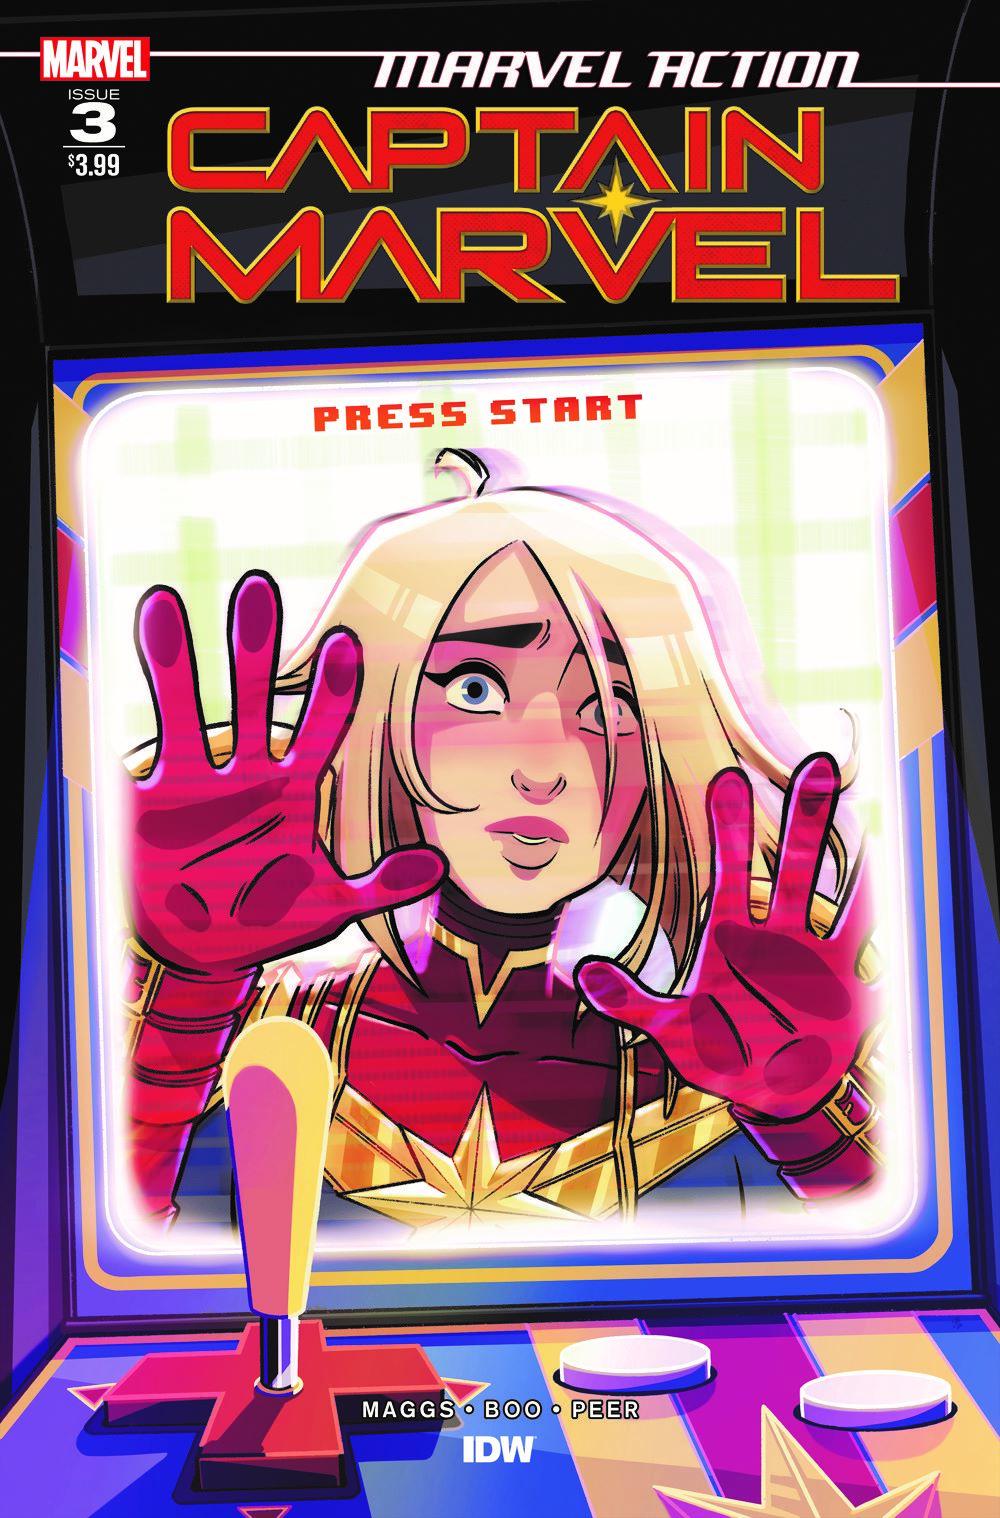 CaptainMarvel_Acvr_03 ComicList Previews: MARVEL ACTION CAPTAIN MARVEL VOLUME 2 #3